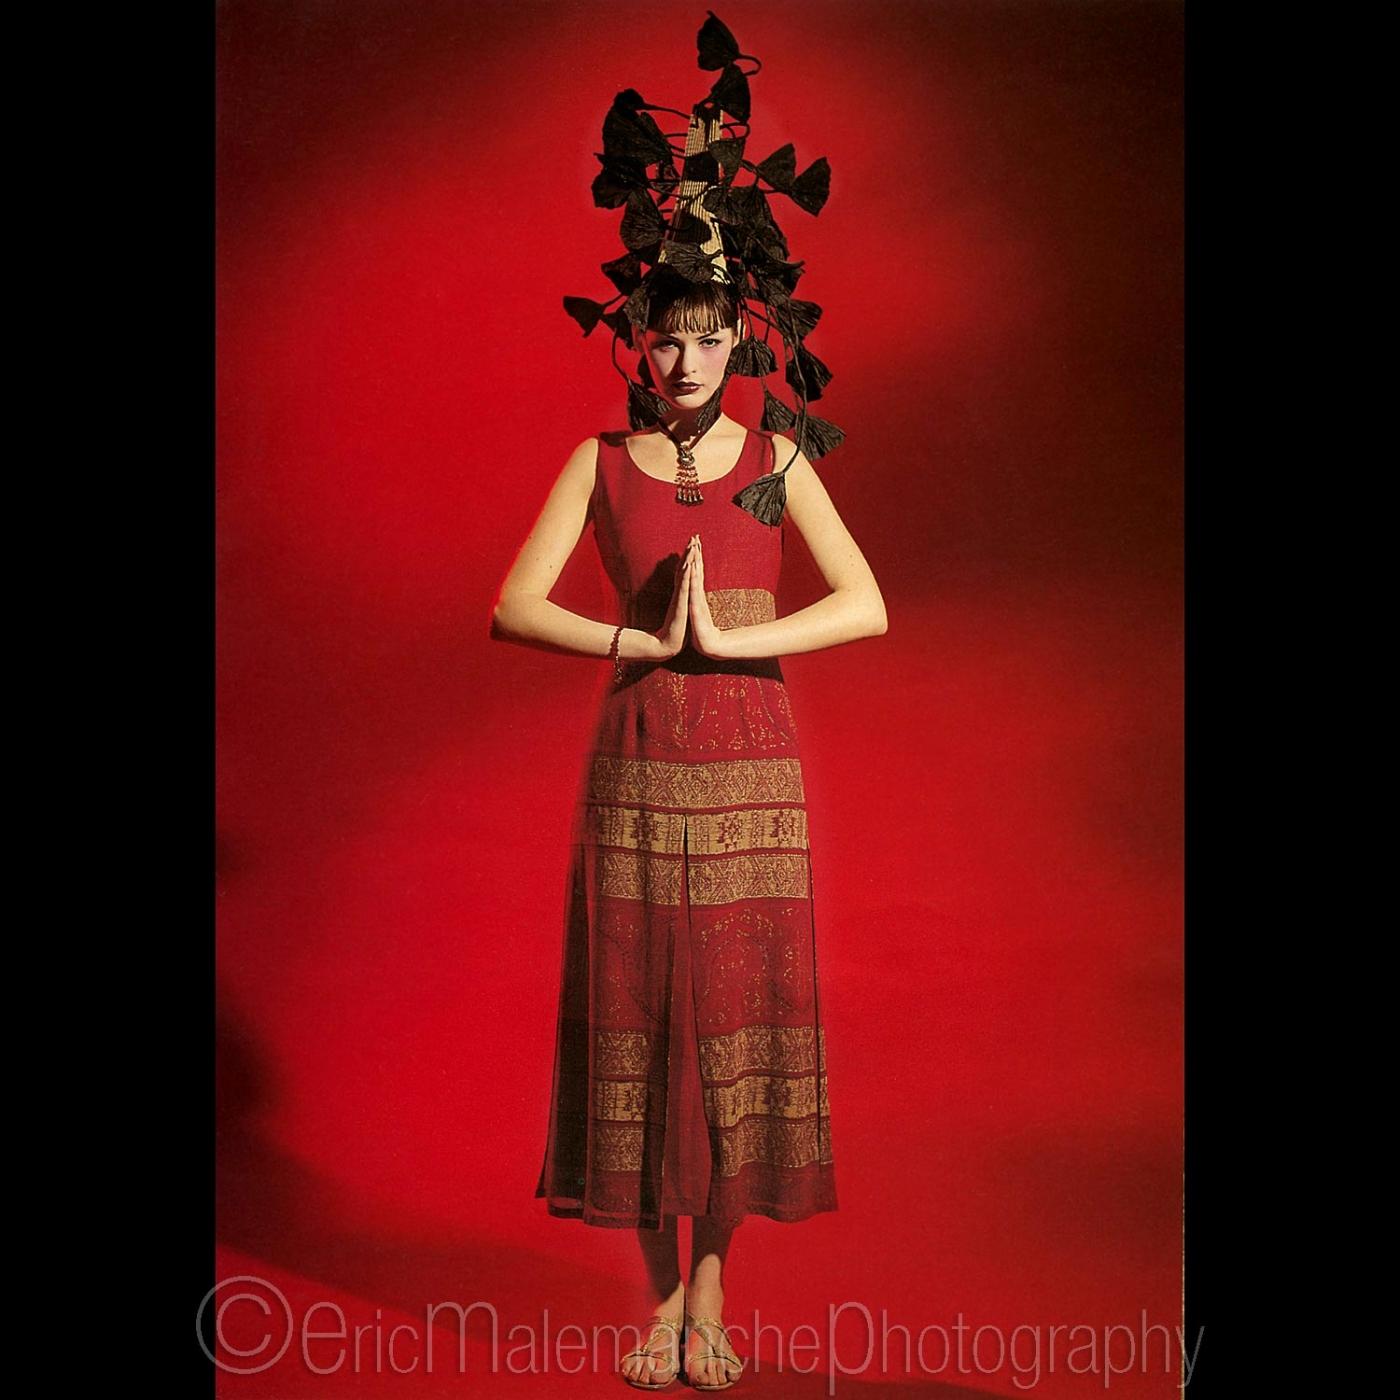 https://www.ericmalemanche.com/imagess/topics/fashion-90-s/liste/Fashion-Zapa-Japan-01.jpg